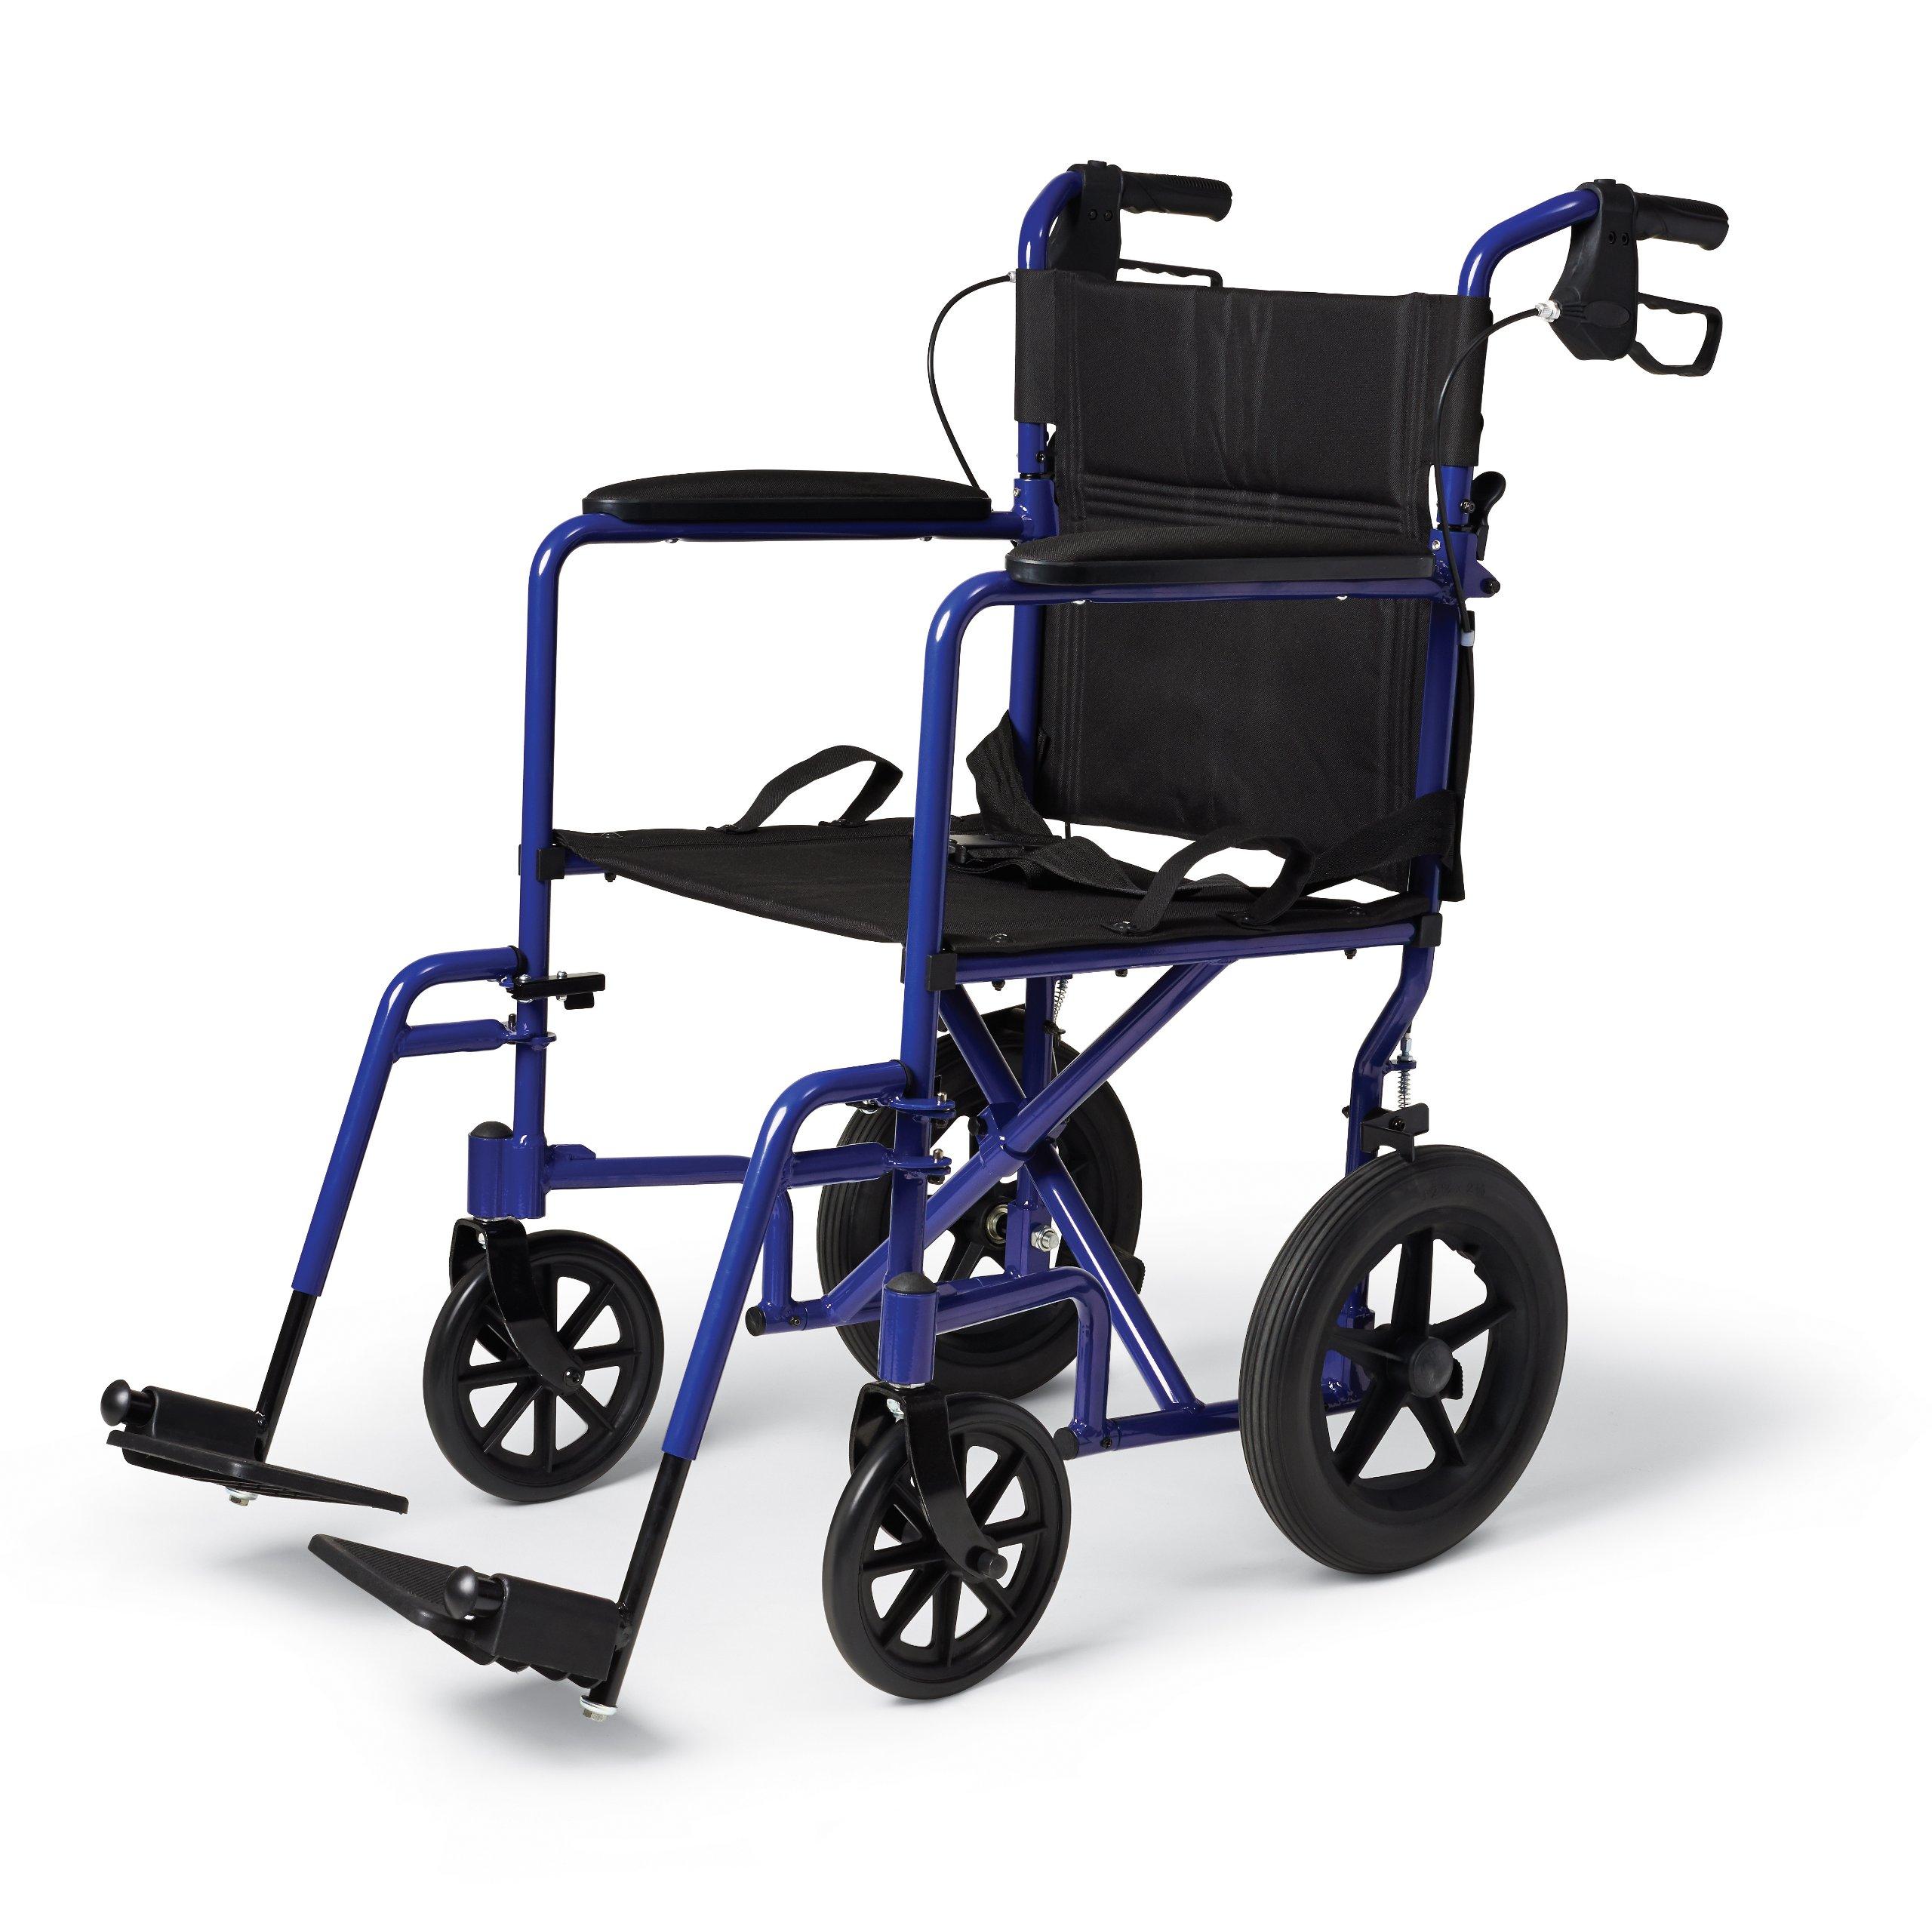 Medline Lightweight Transport Adult Folding Wheelchair with Handbrakes, Blue